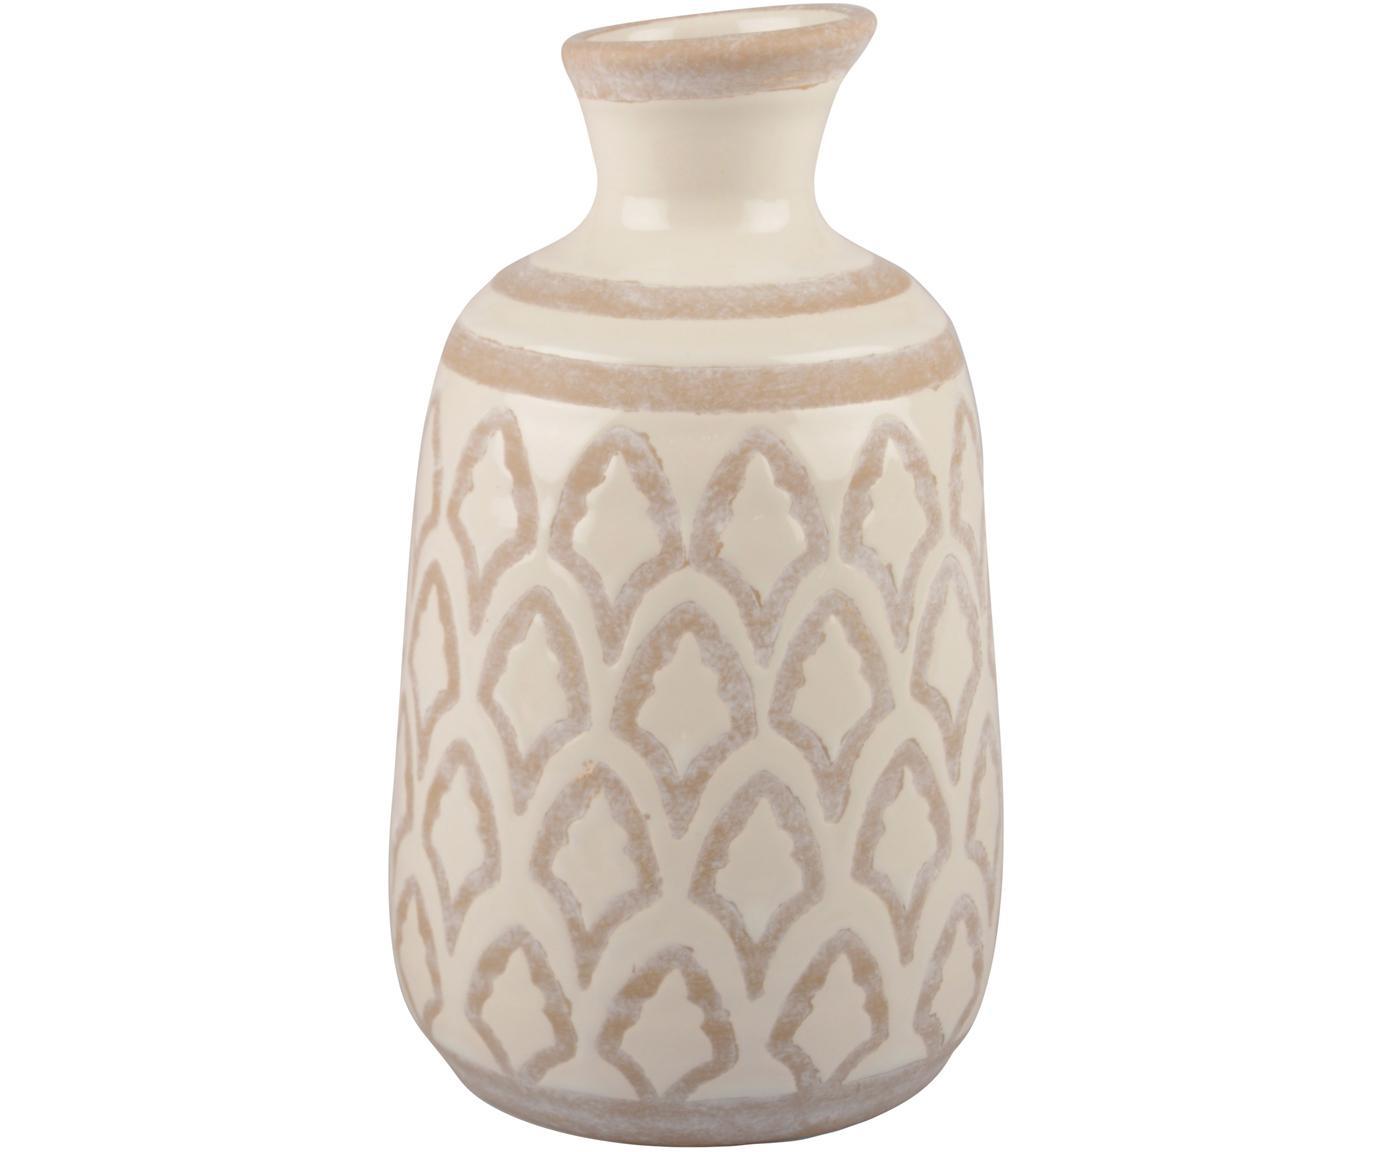 Vase Rustica aus Keramik, Keramik, Cremefarben, Beige, Ø 14 x H 22 cm